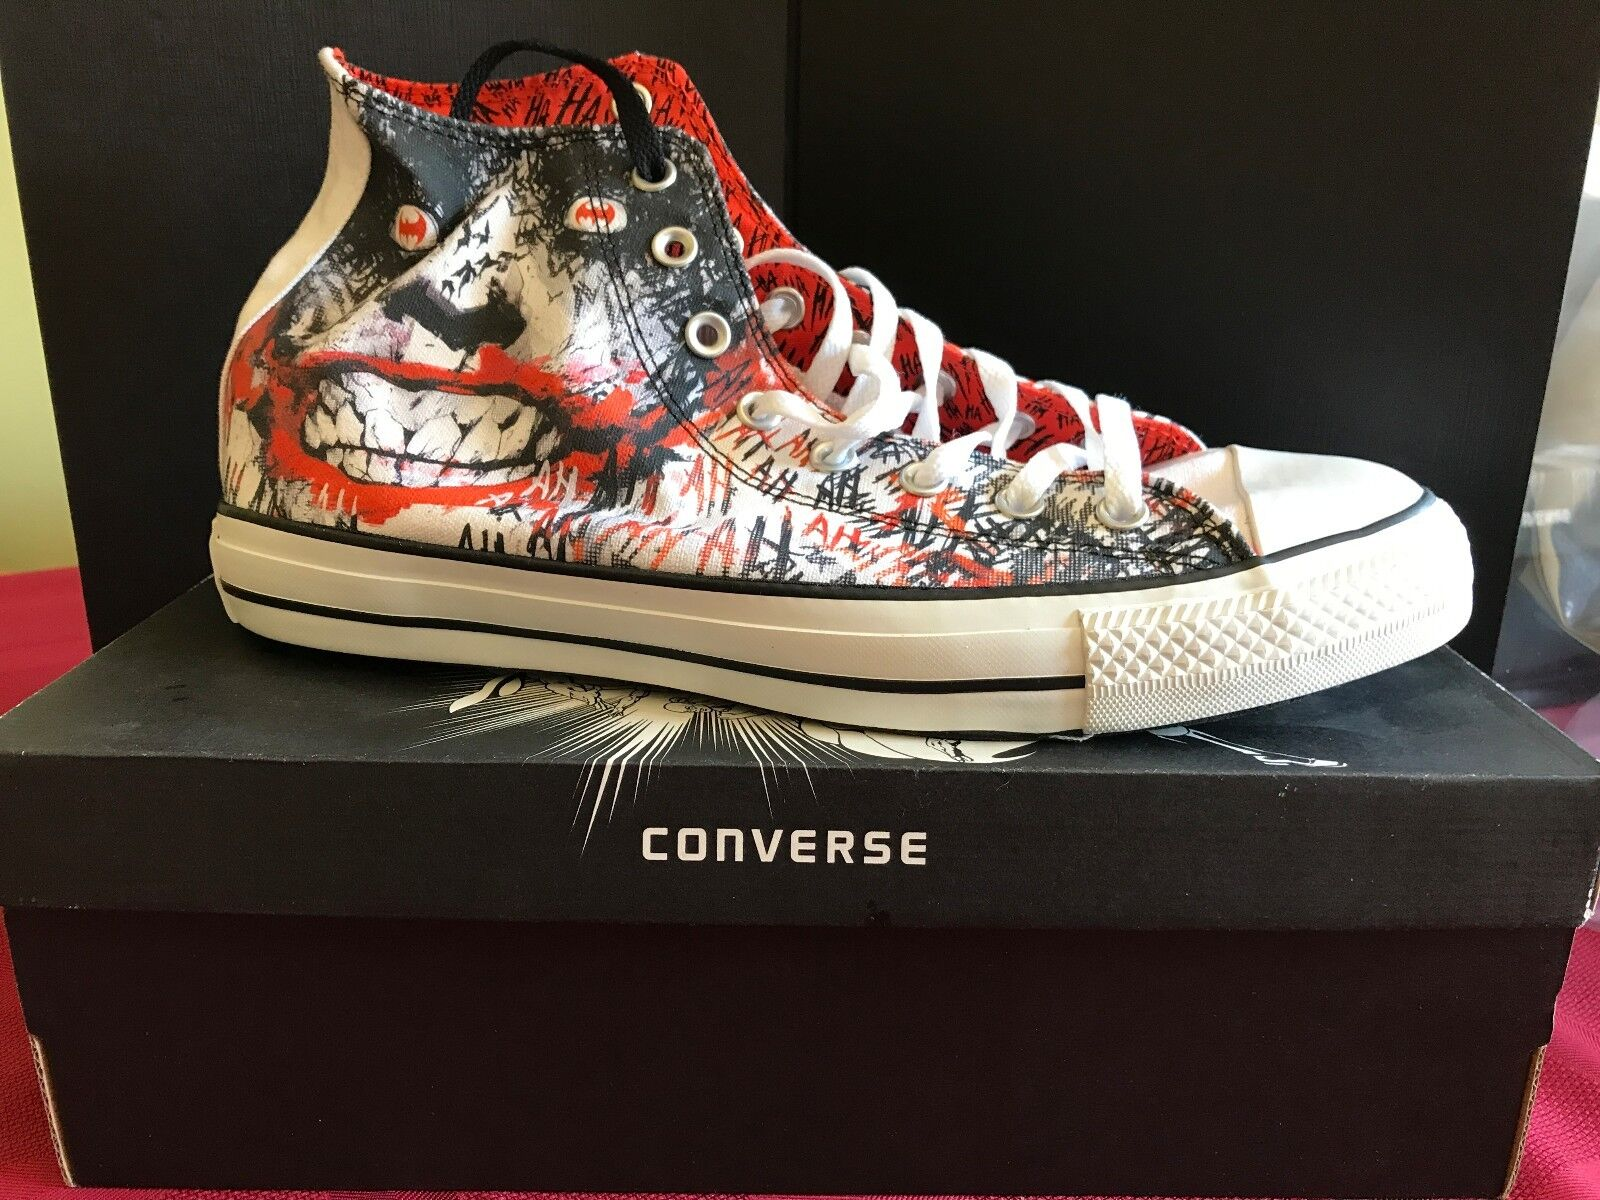 Converse Chuck Taylor All Star Zapatos Batman Joker detective 880 Zapatos Star  11 Nuevo 98c1b7